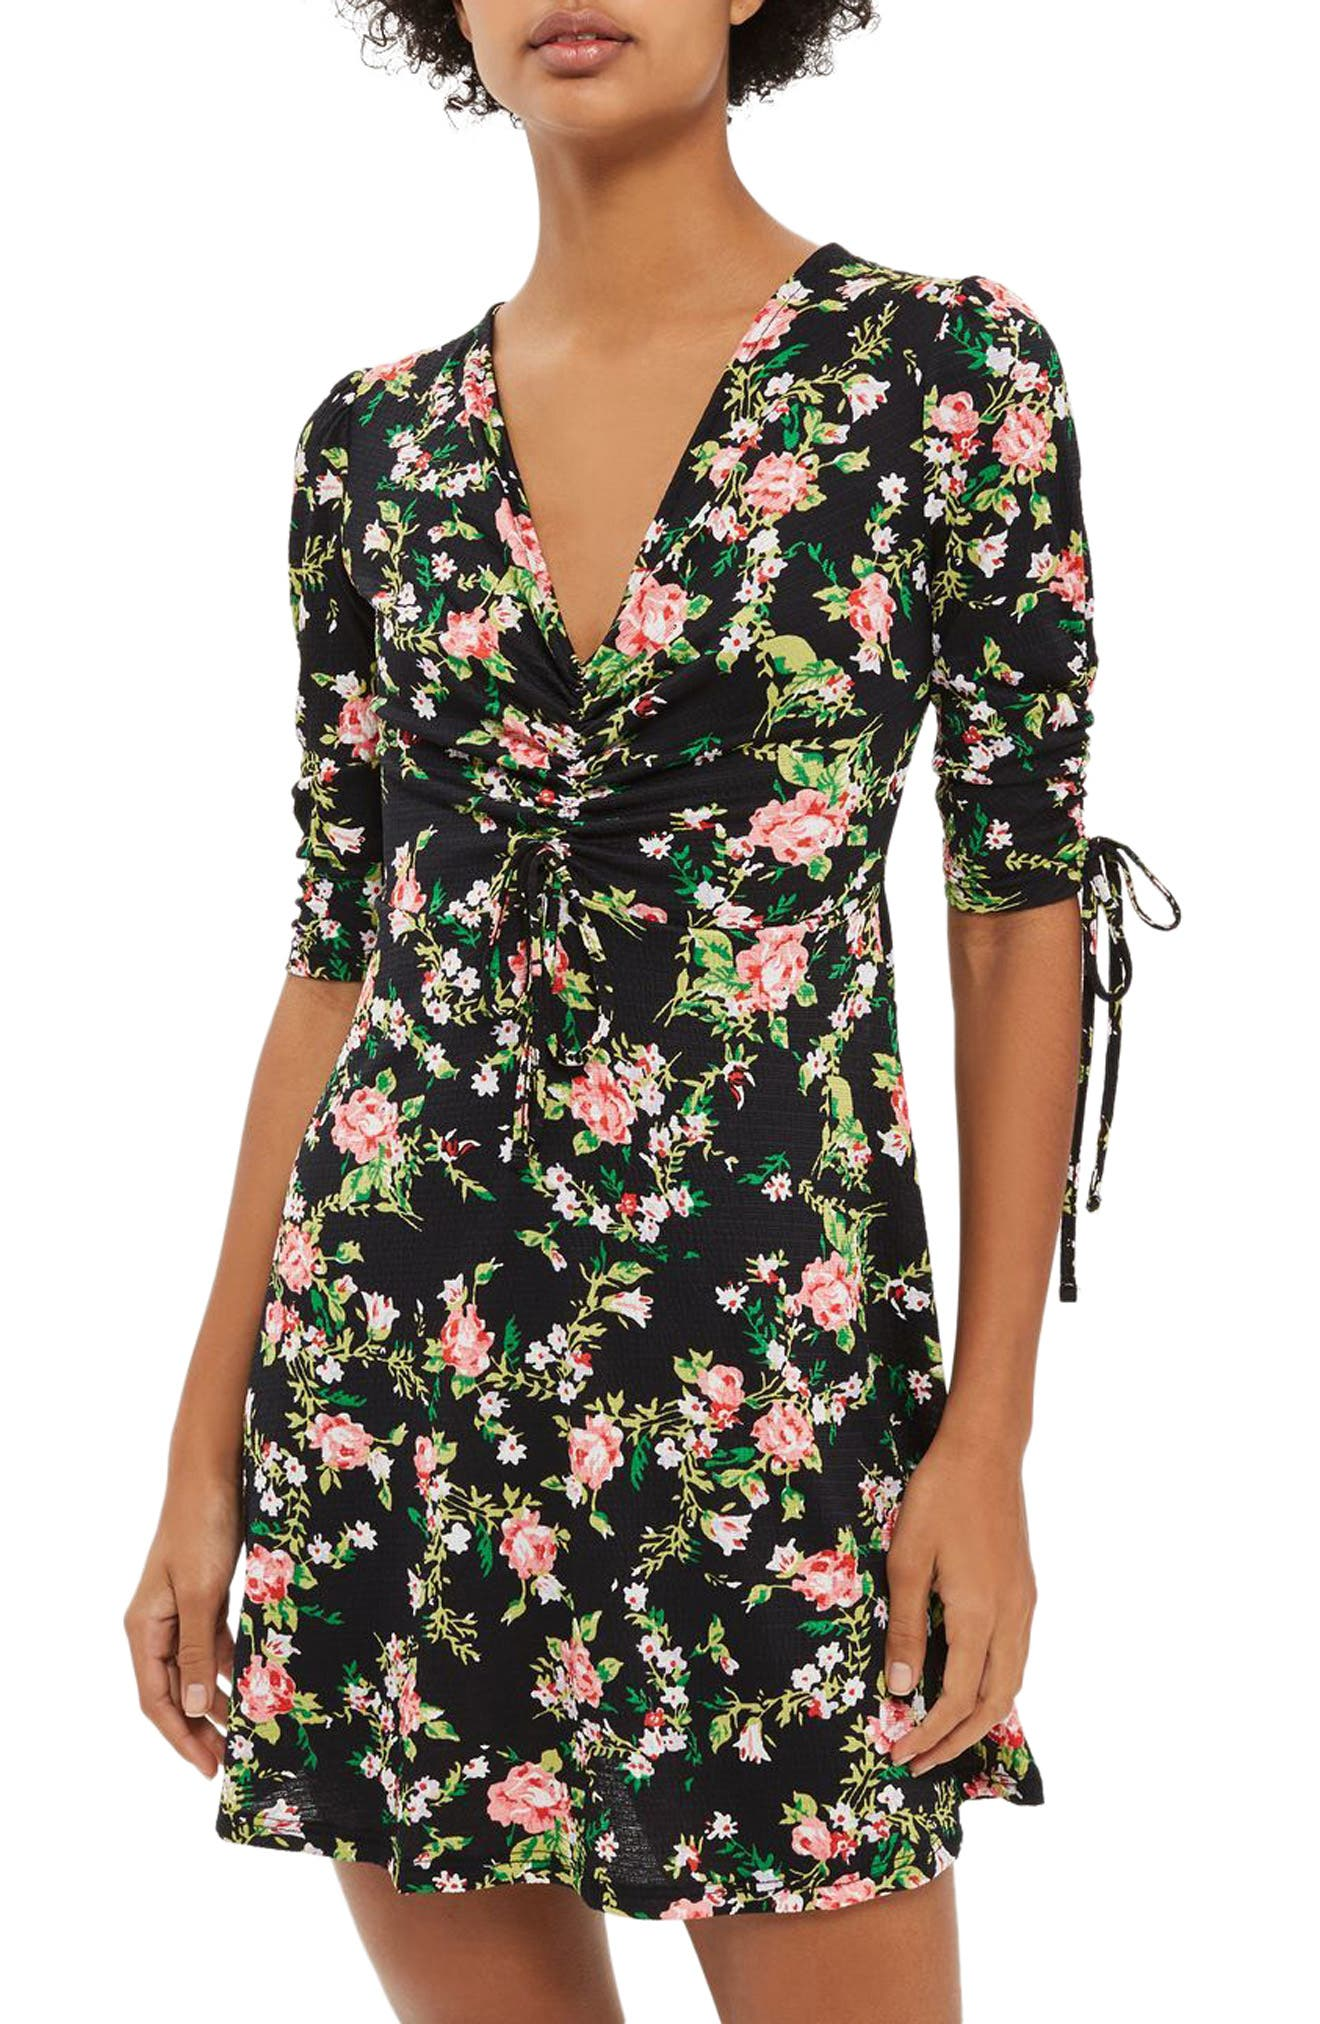 Topshop Floral Ruched Tea Dress (Petite)